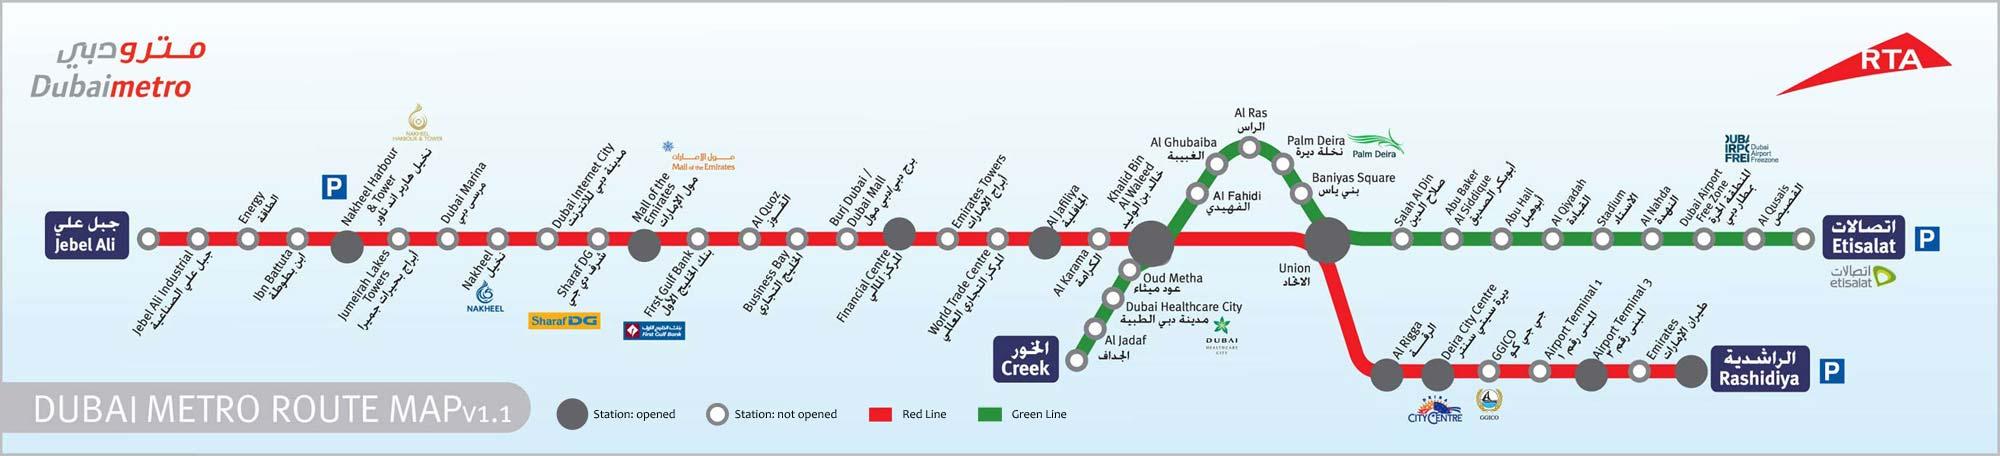 Схема метро Дубая